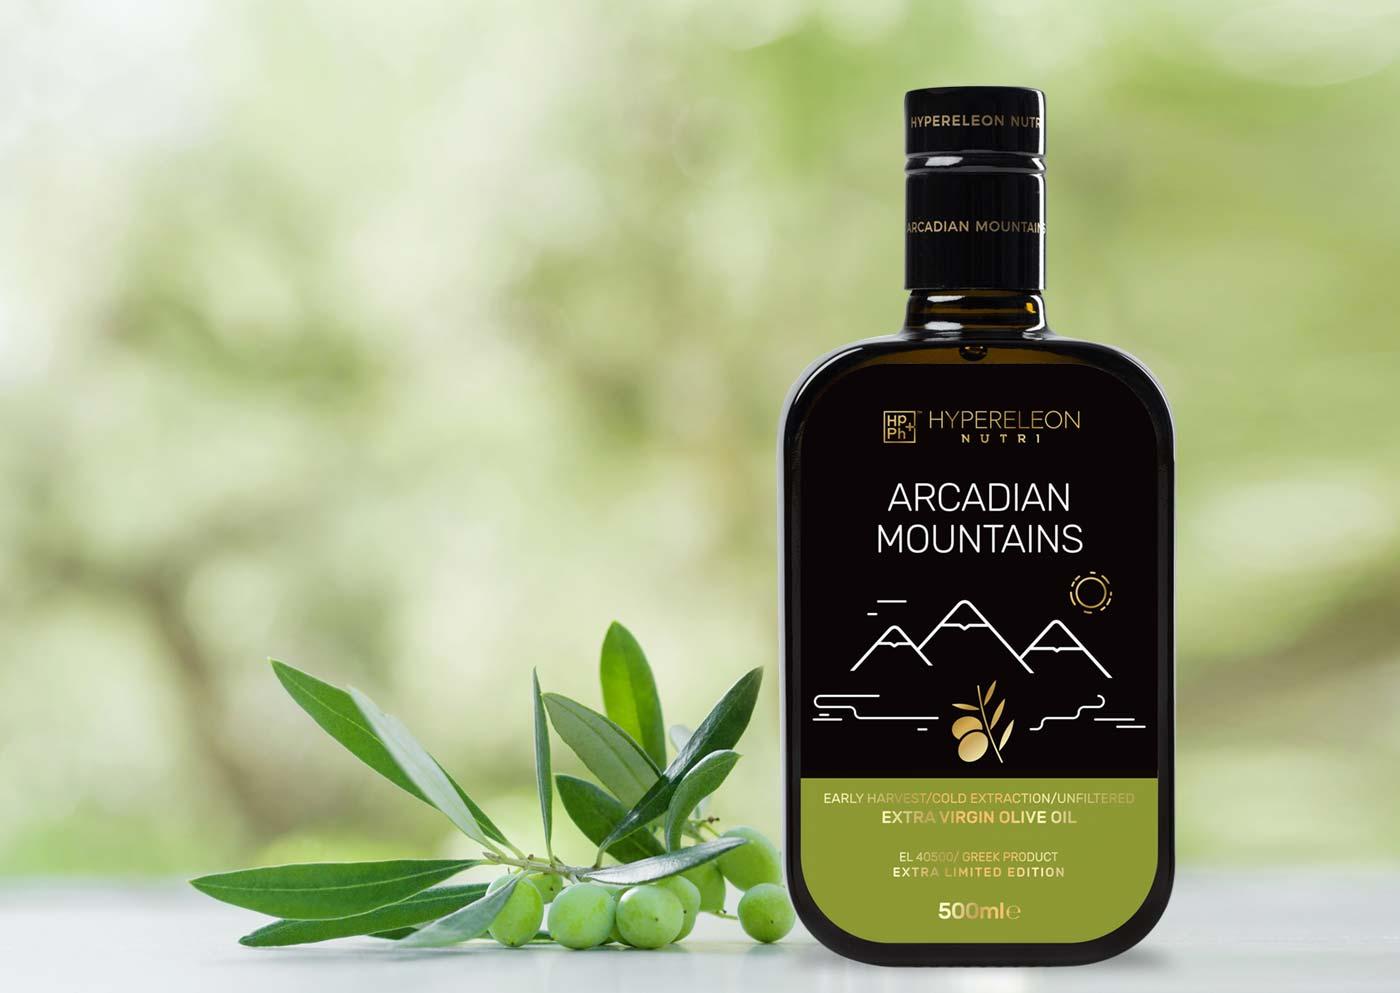 hypereleon nutri arcadian mountains rich in popyphenols